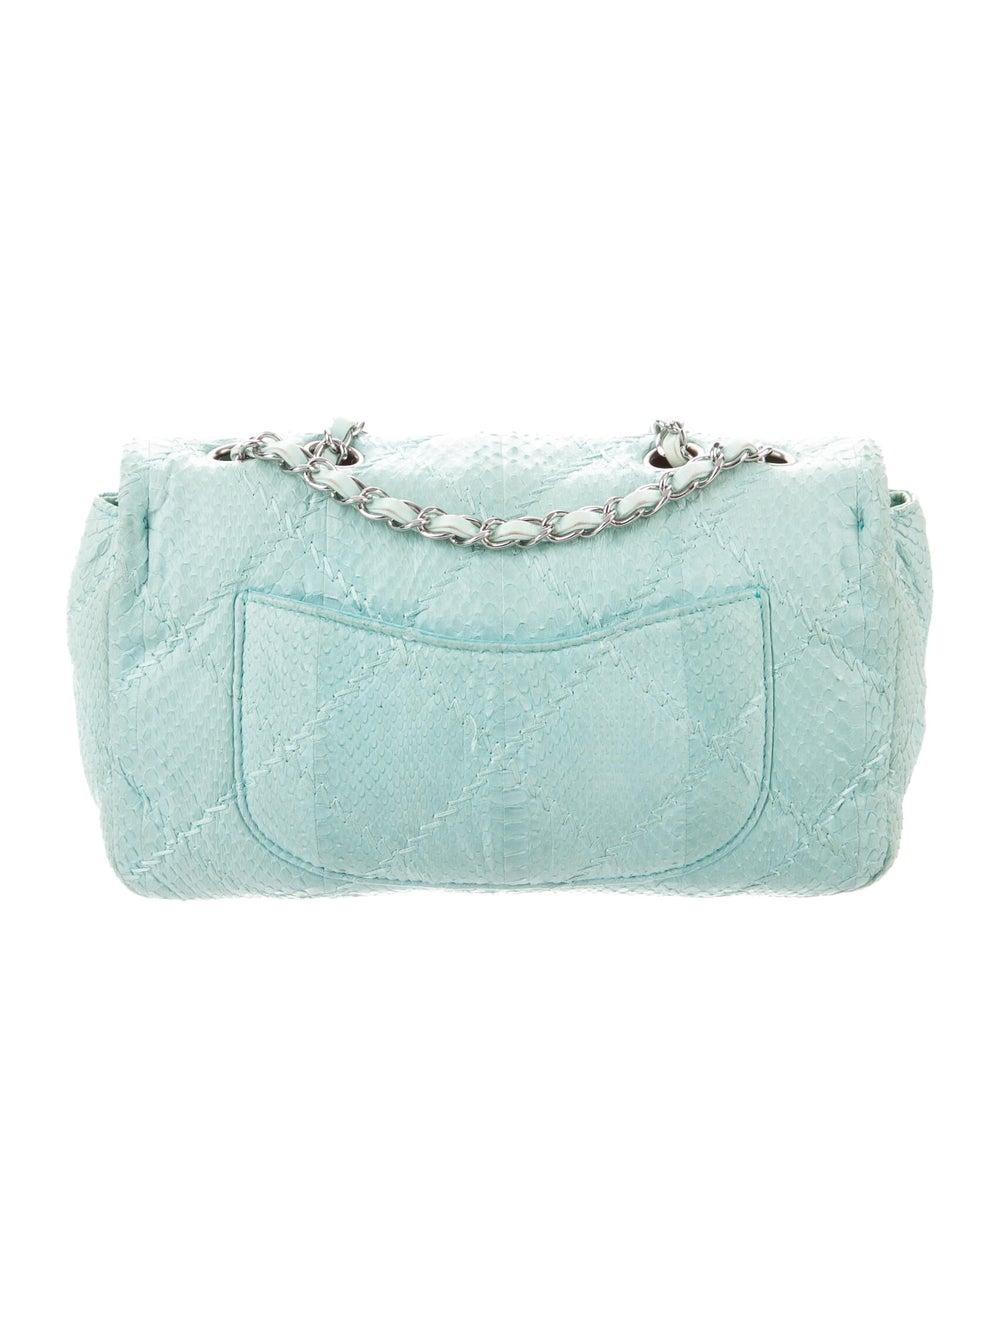 Chanel Python Ultimate Stitch Flap Bag Blue - image 4